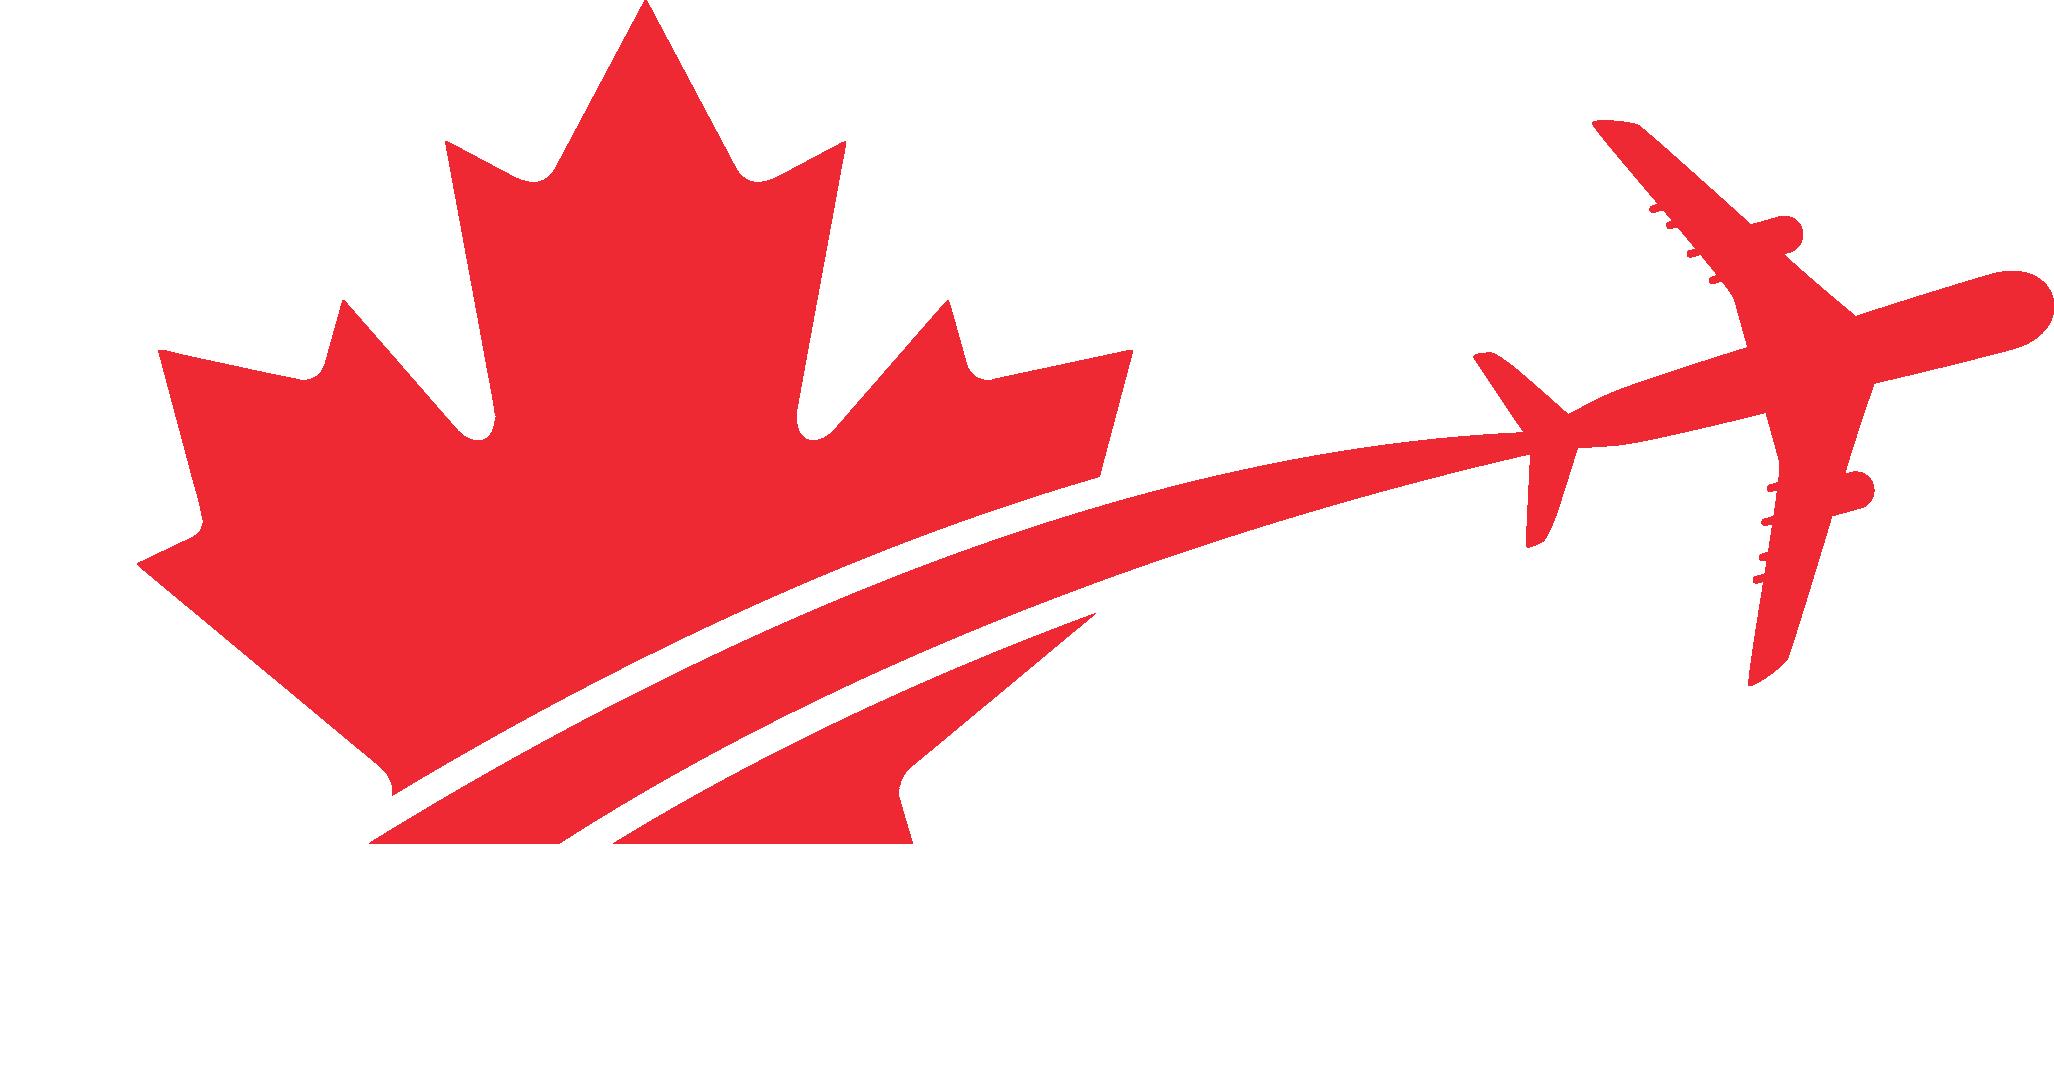 دریافت ویزای دائم و موقت کانادا